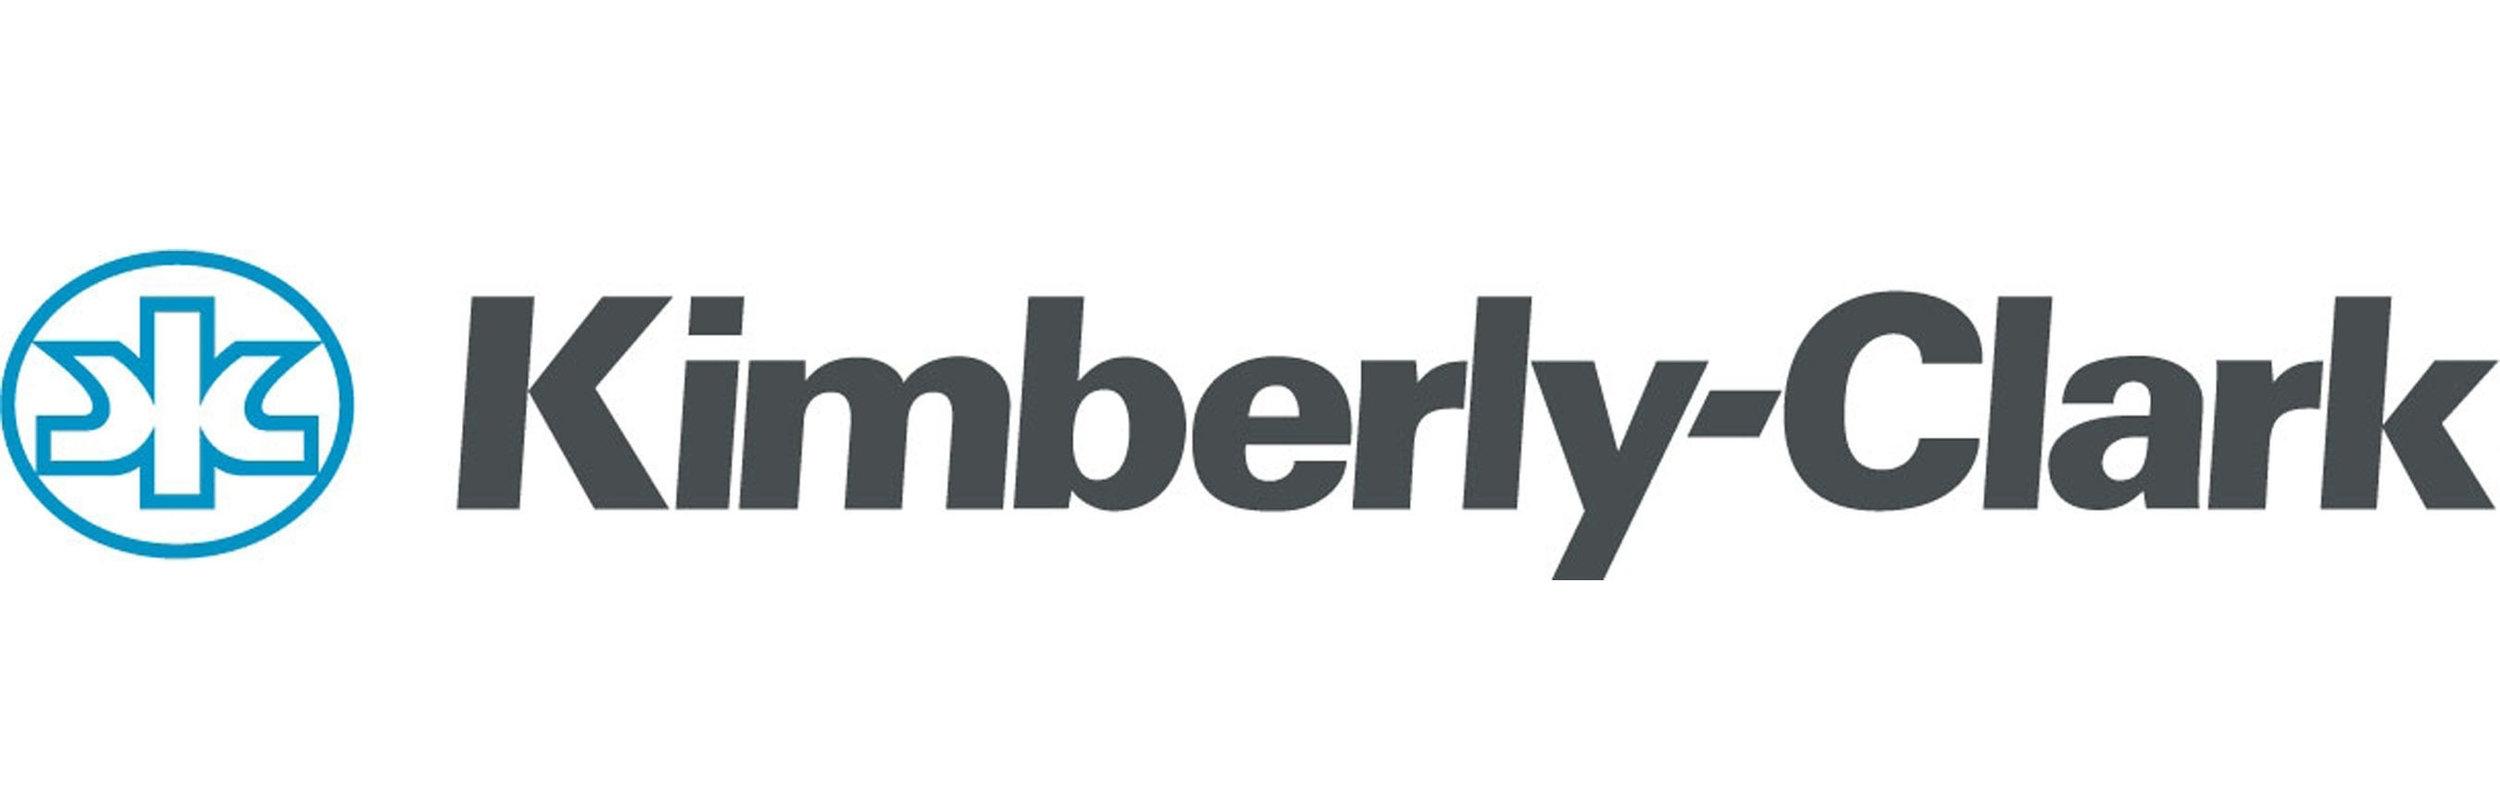 kimberly clark logo.jpeg